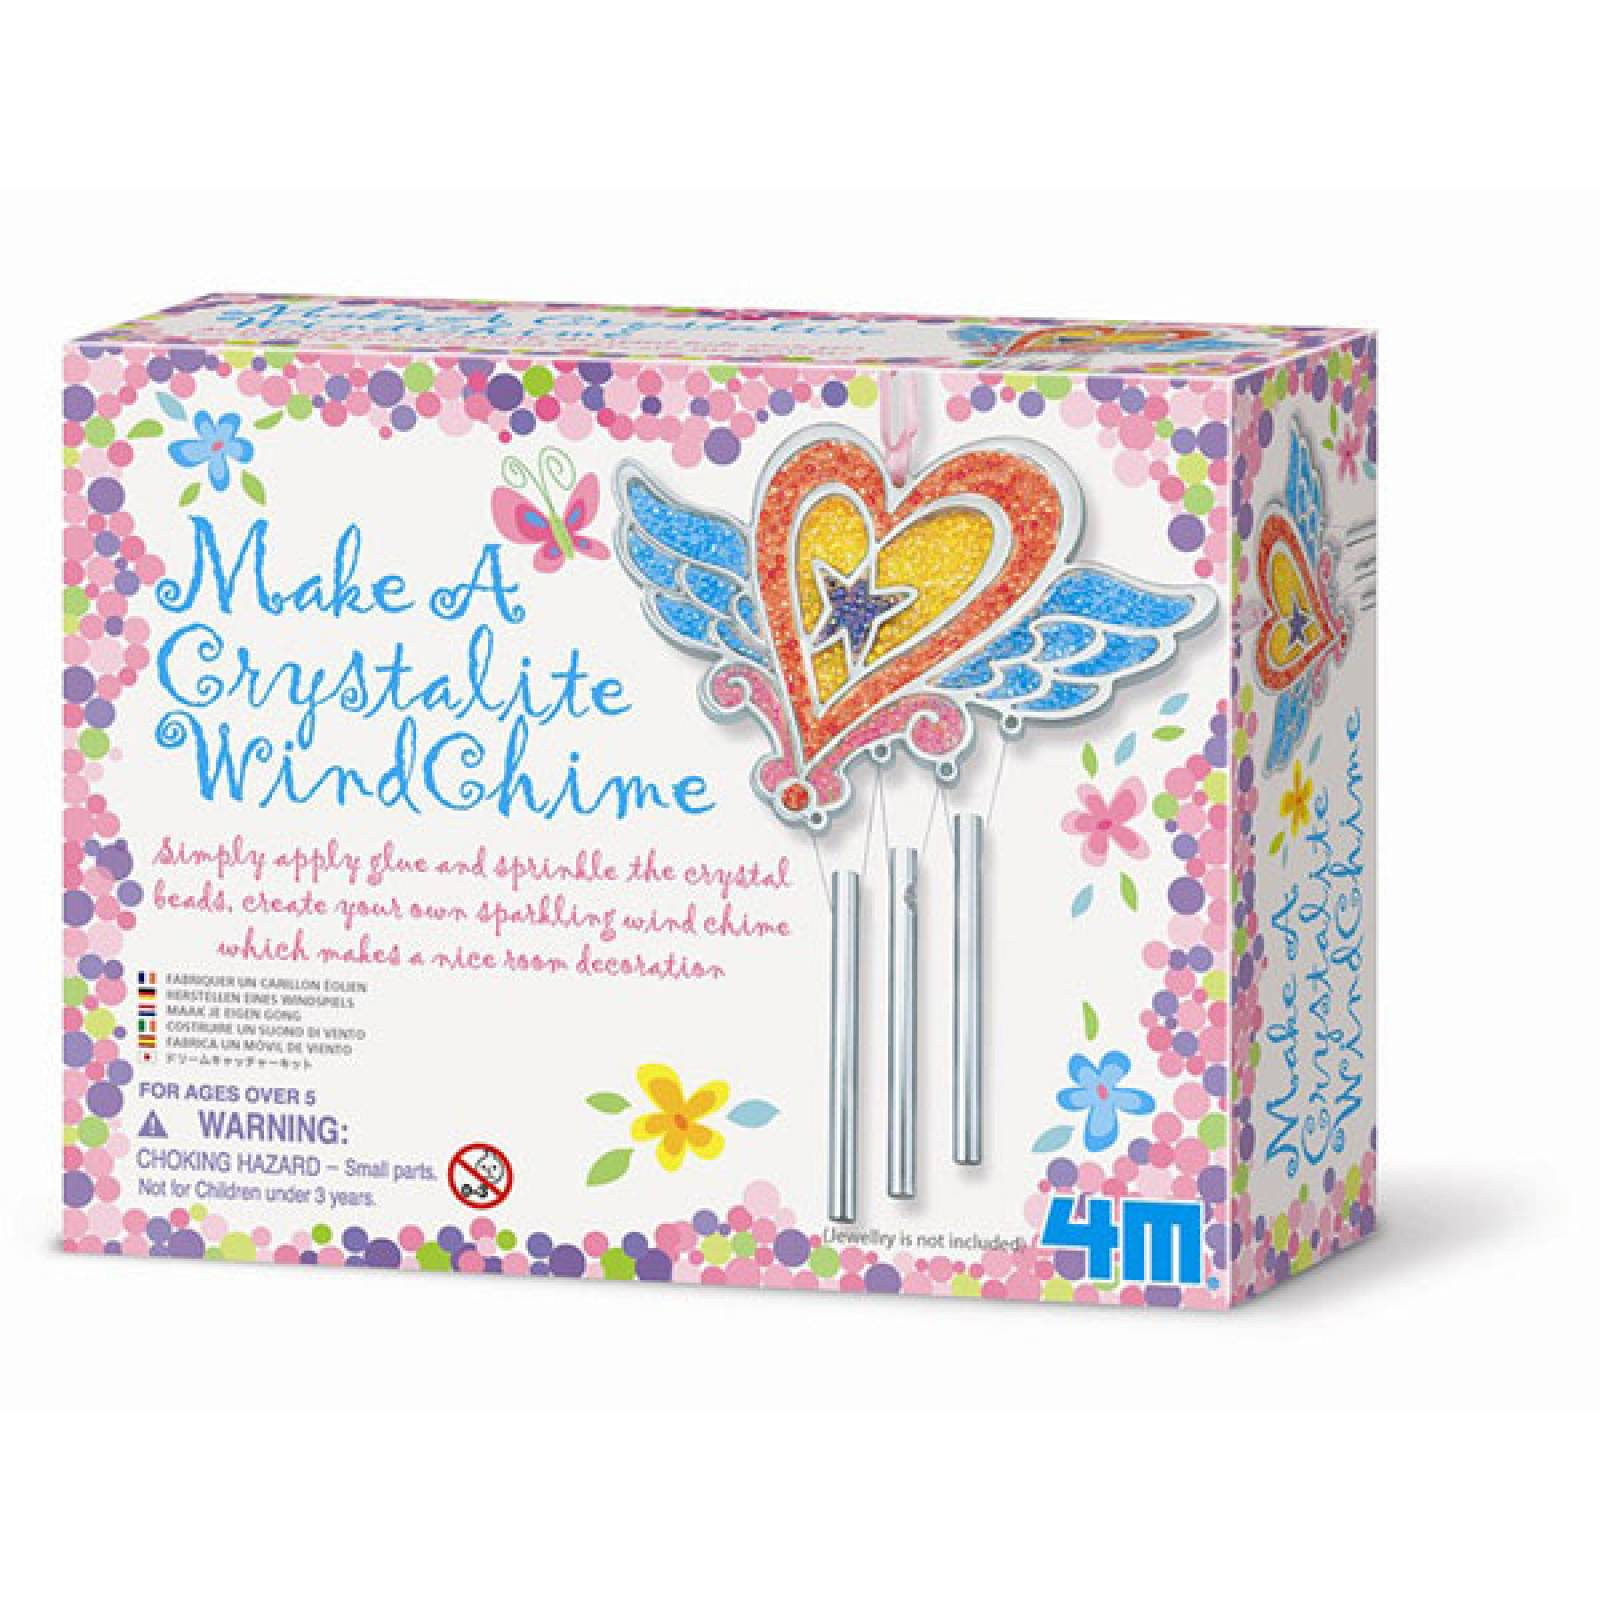 Make A Crystalite Windchime Kit 5+